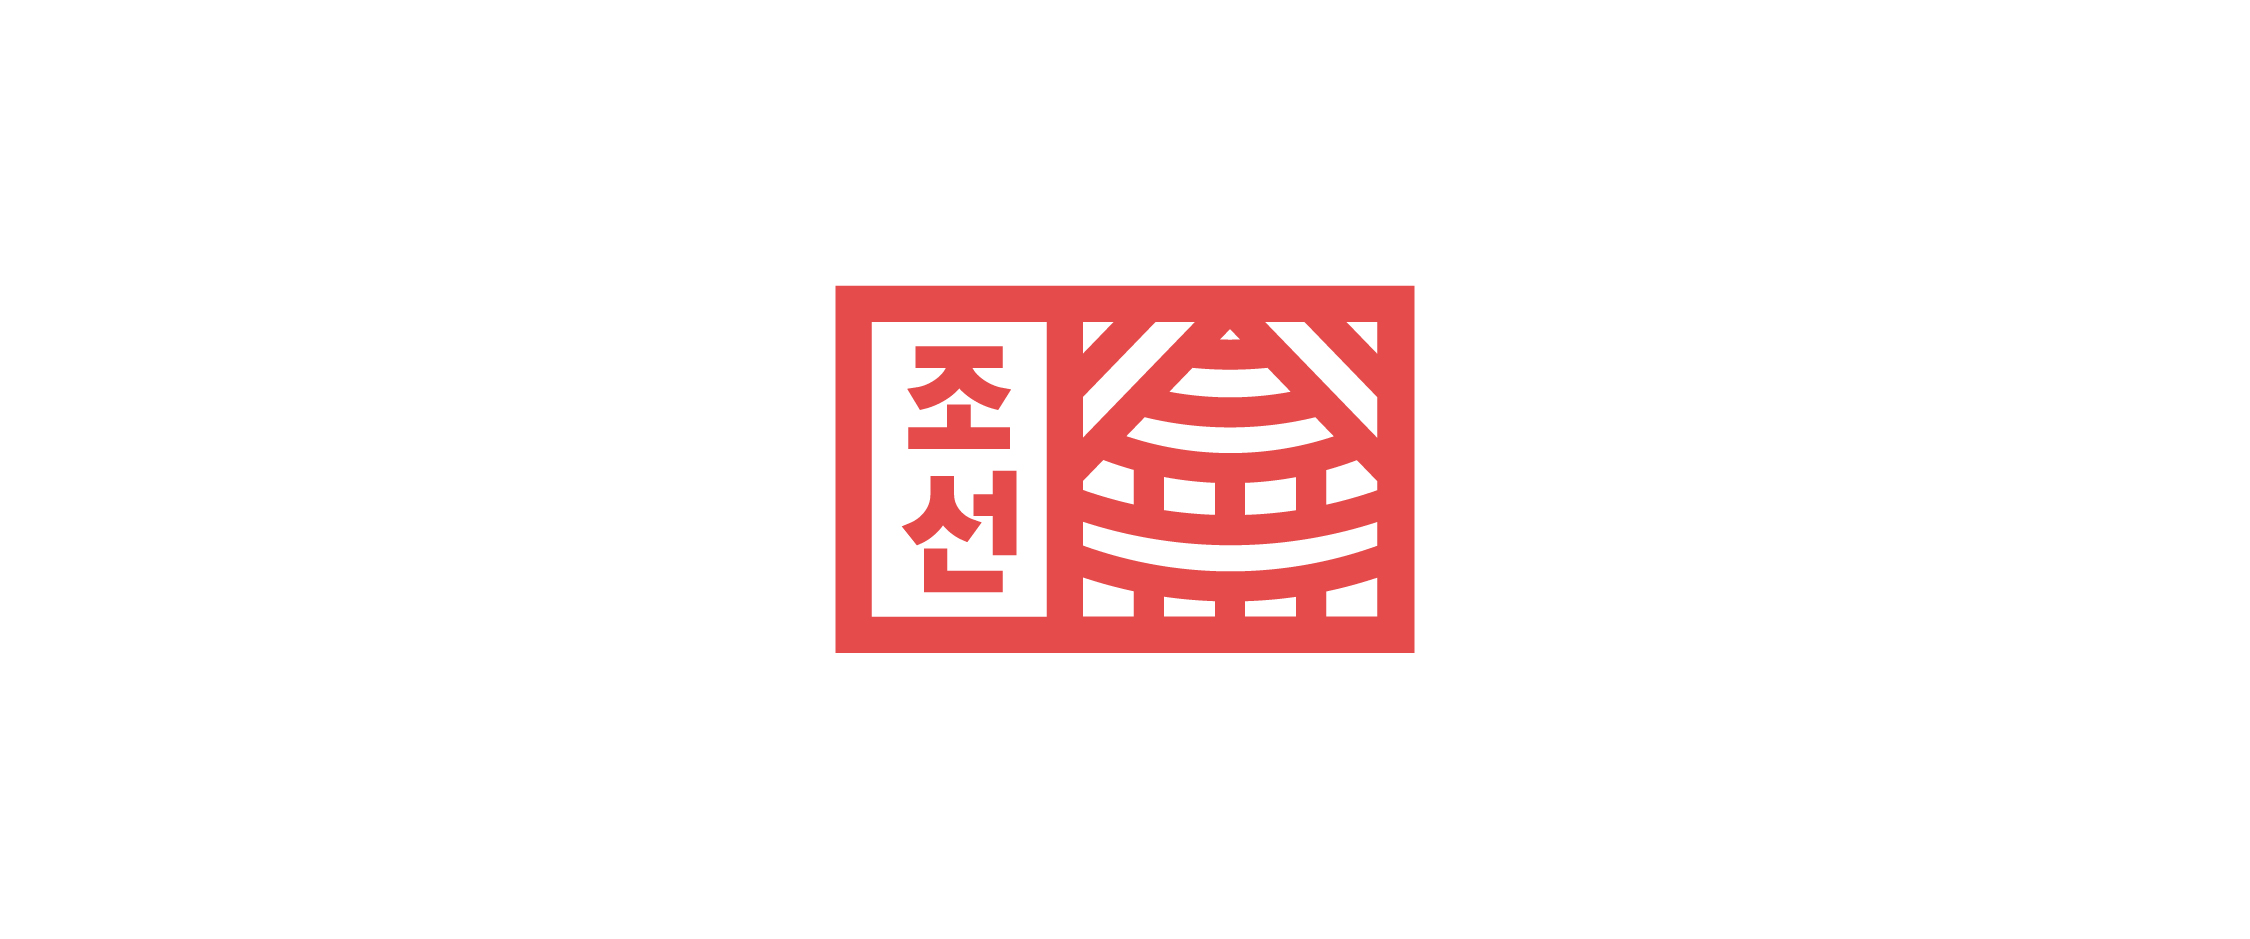 ss joseon-05.jpg